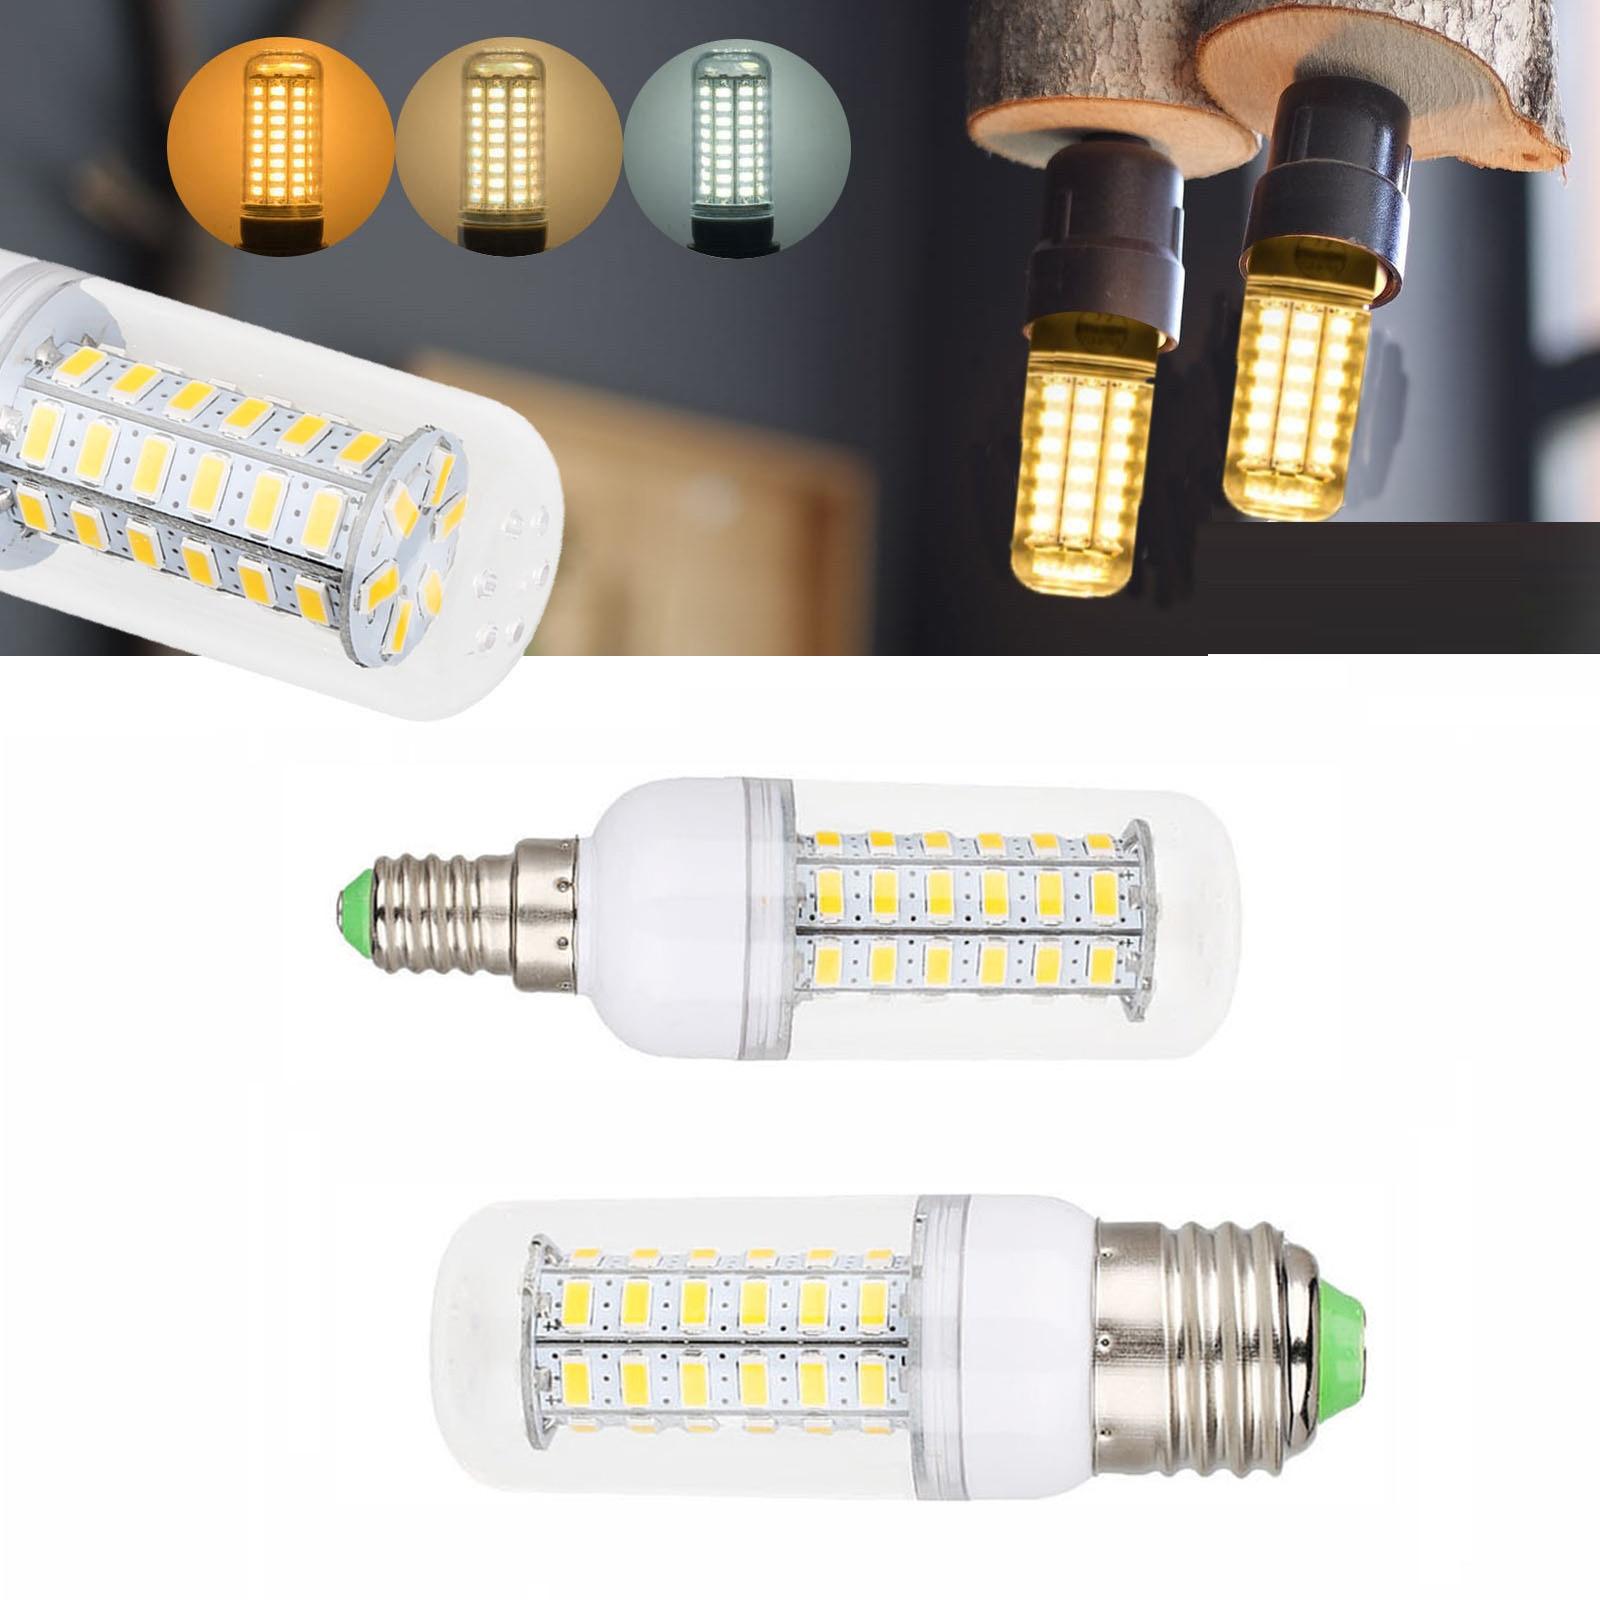 E27 Led Lamp E14 Bulb Smd 5730 220v